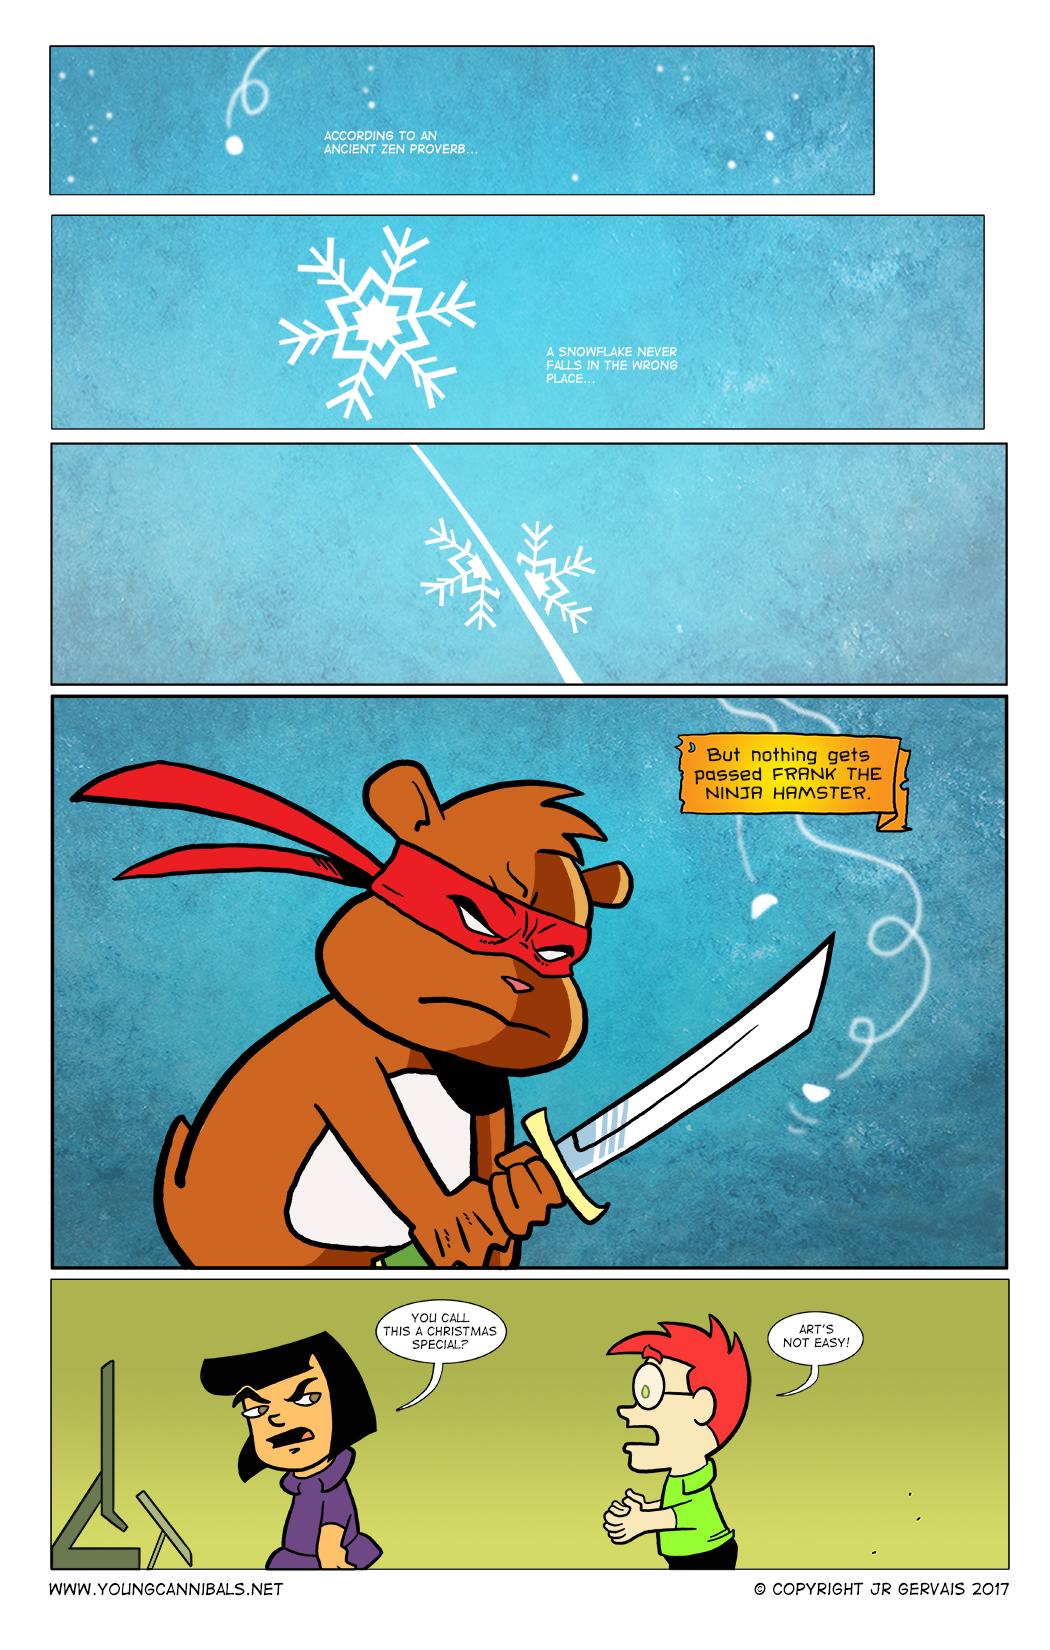 A Frank the Ninja Hamster Christmas Special